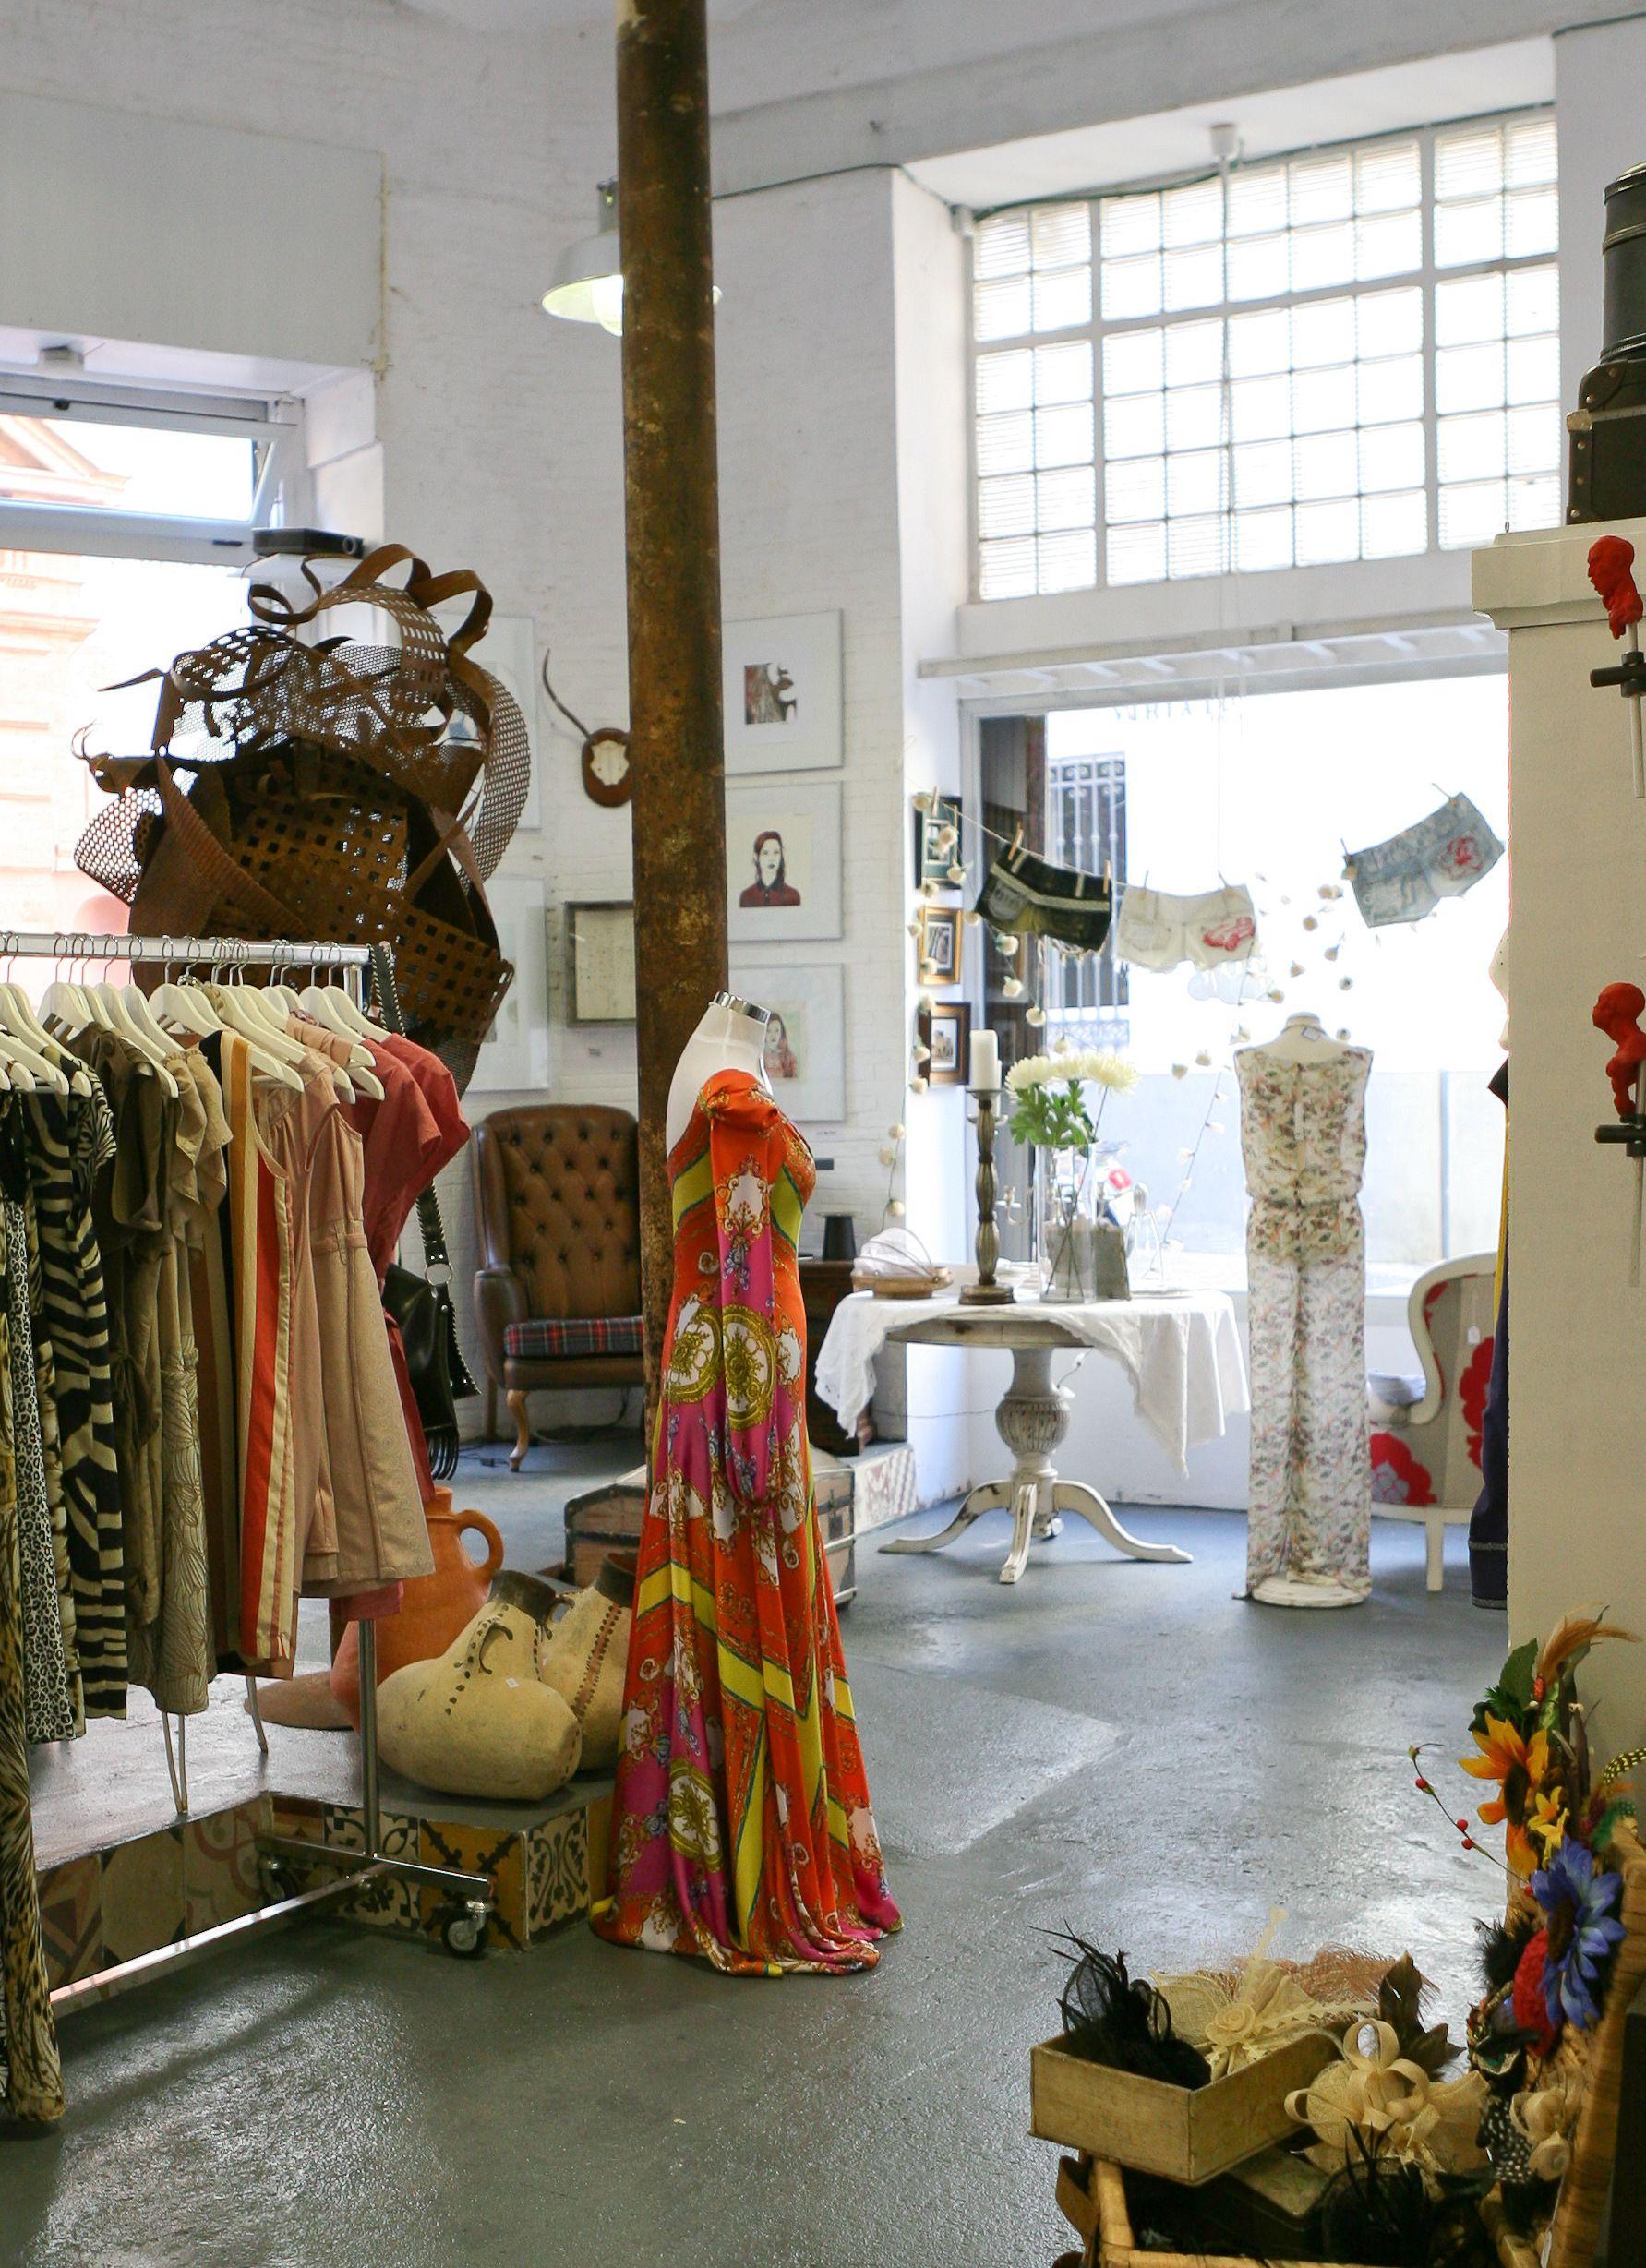 Wabi Sabi Shop & Gallery | Seville, Spain Clothesline of shorts in ...